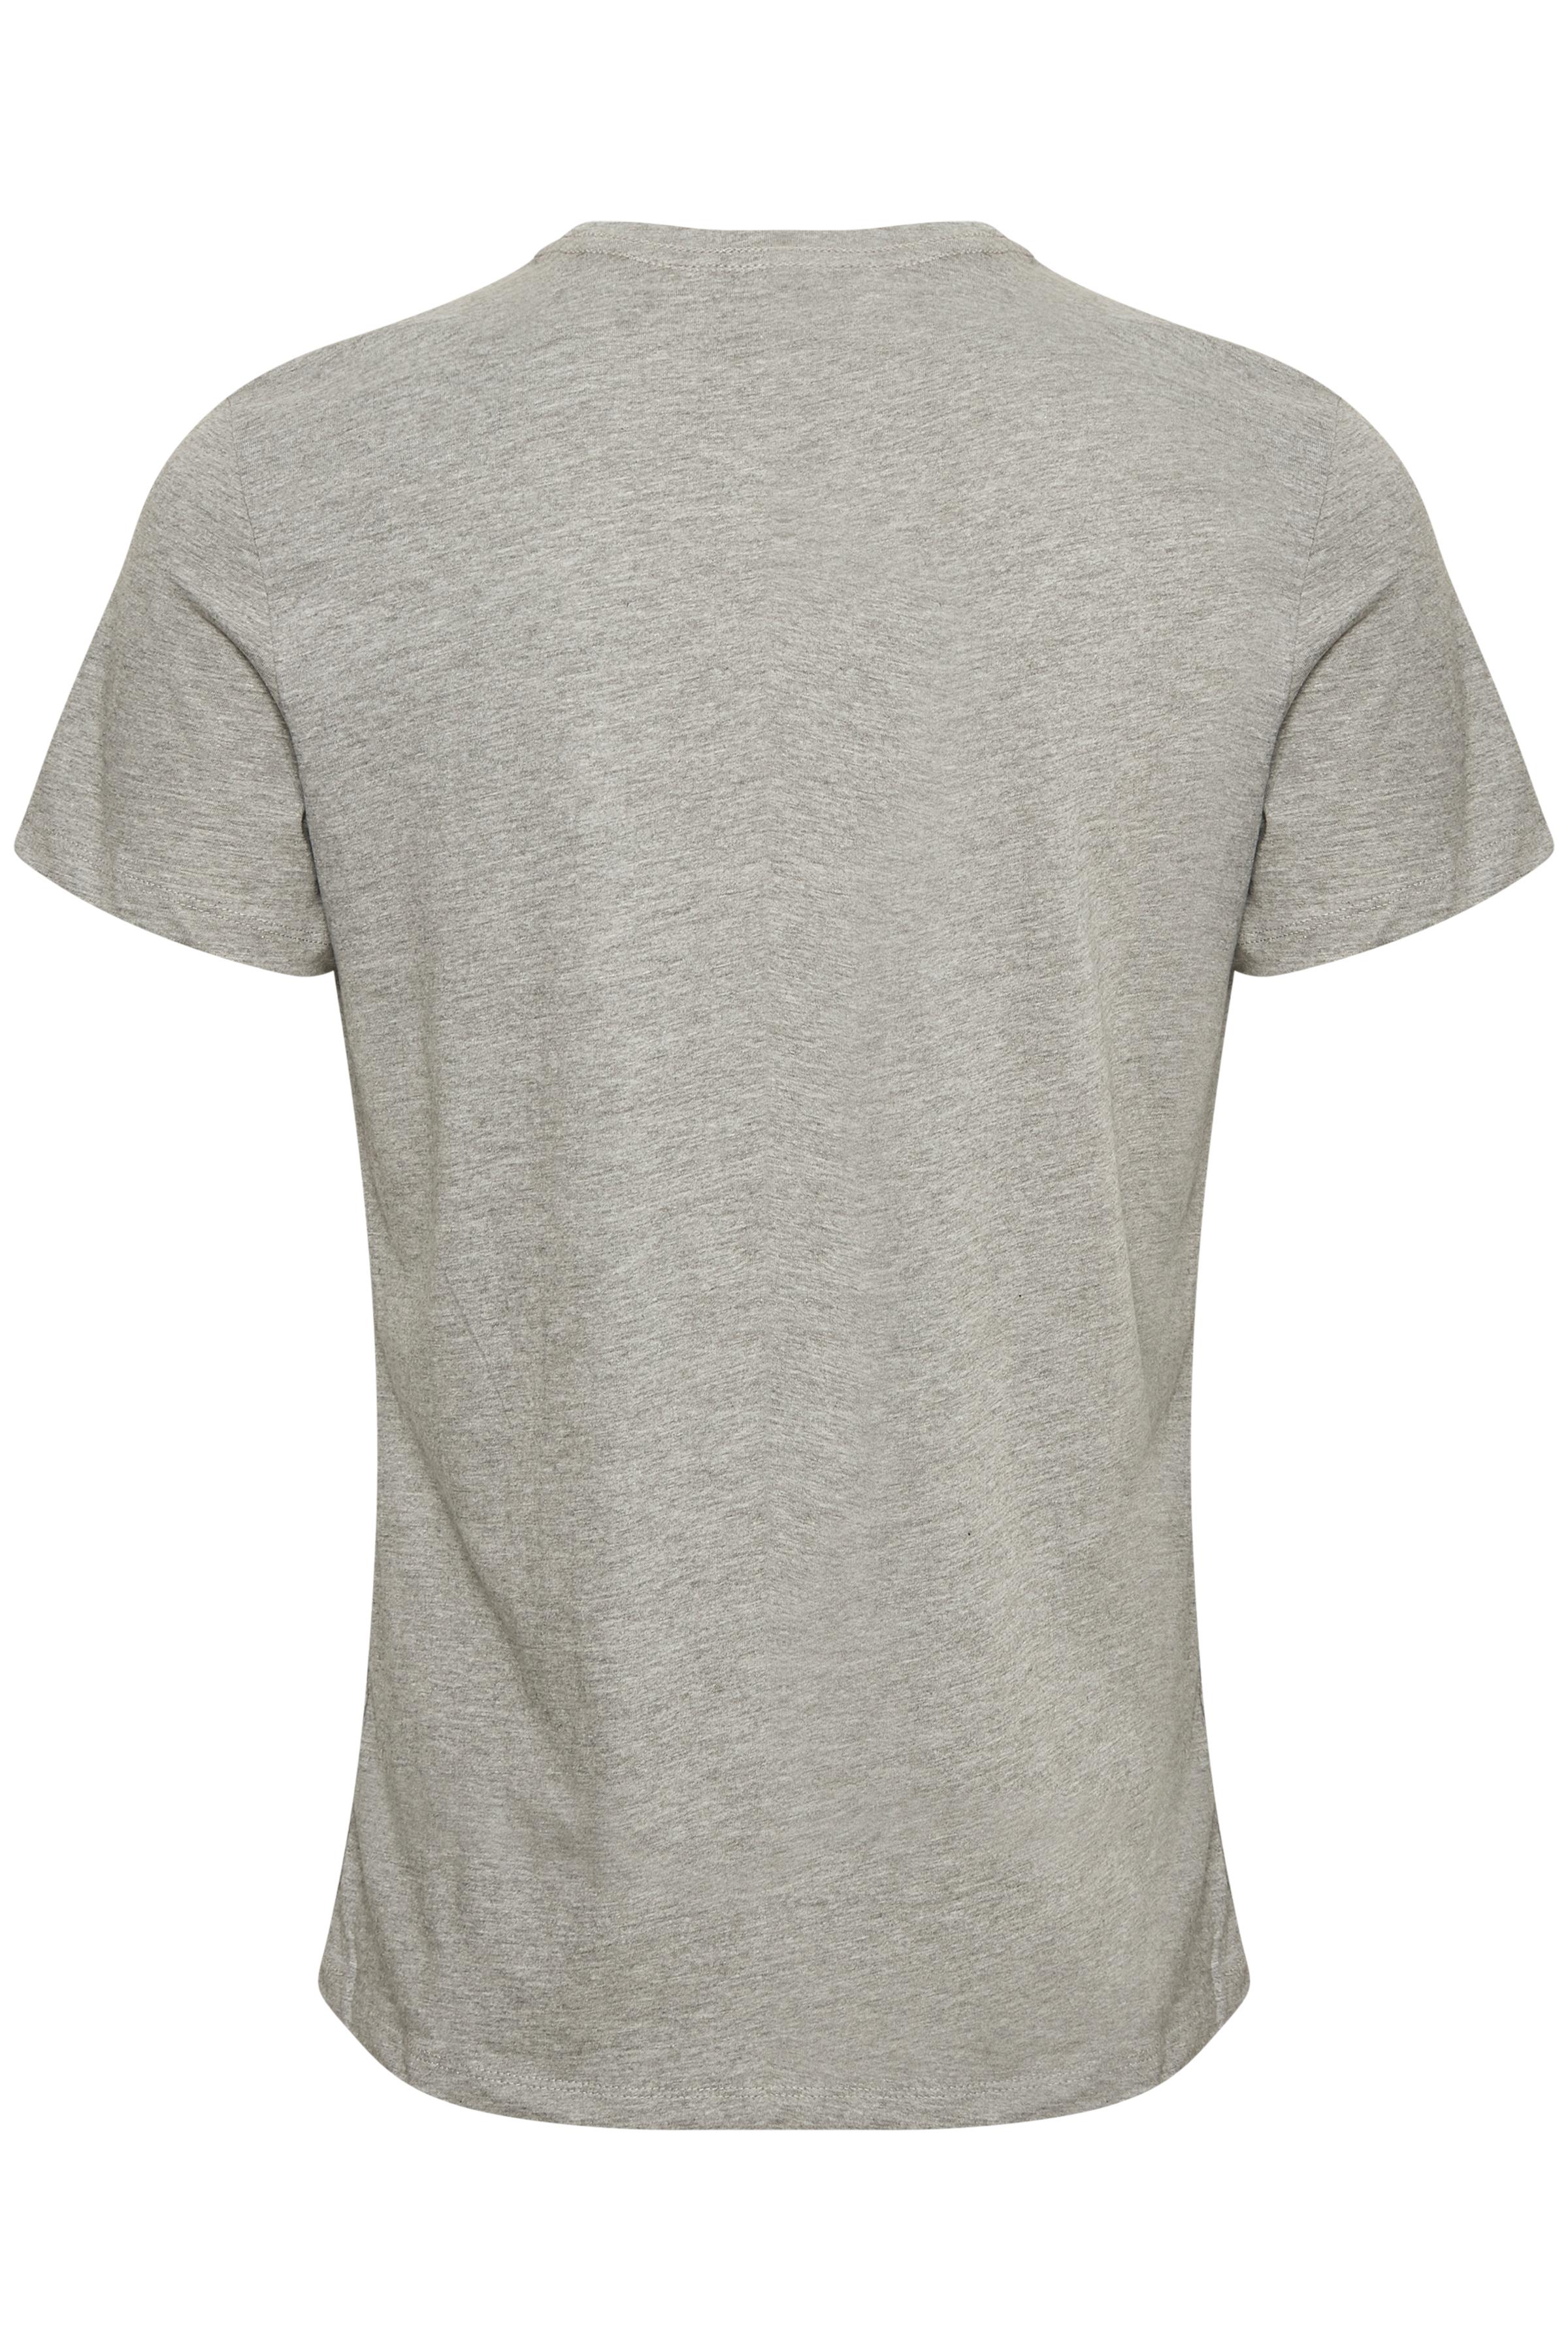 Gråmeleret Kortærmet T-shirt fra Blend He – Køb Gråmeleret Kortærmet T-shirt fra str. XS-3XL her